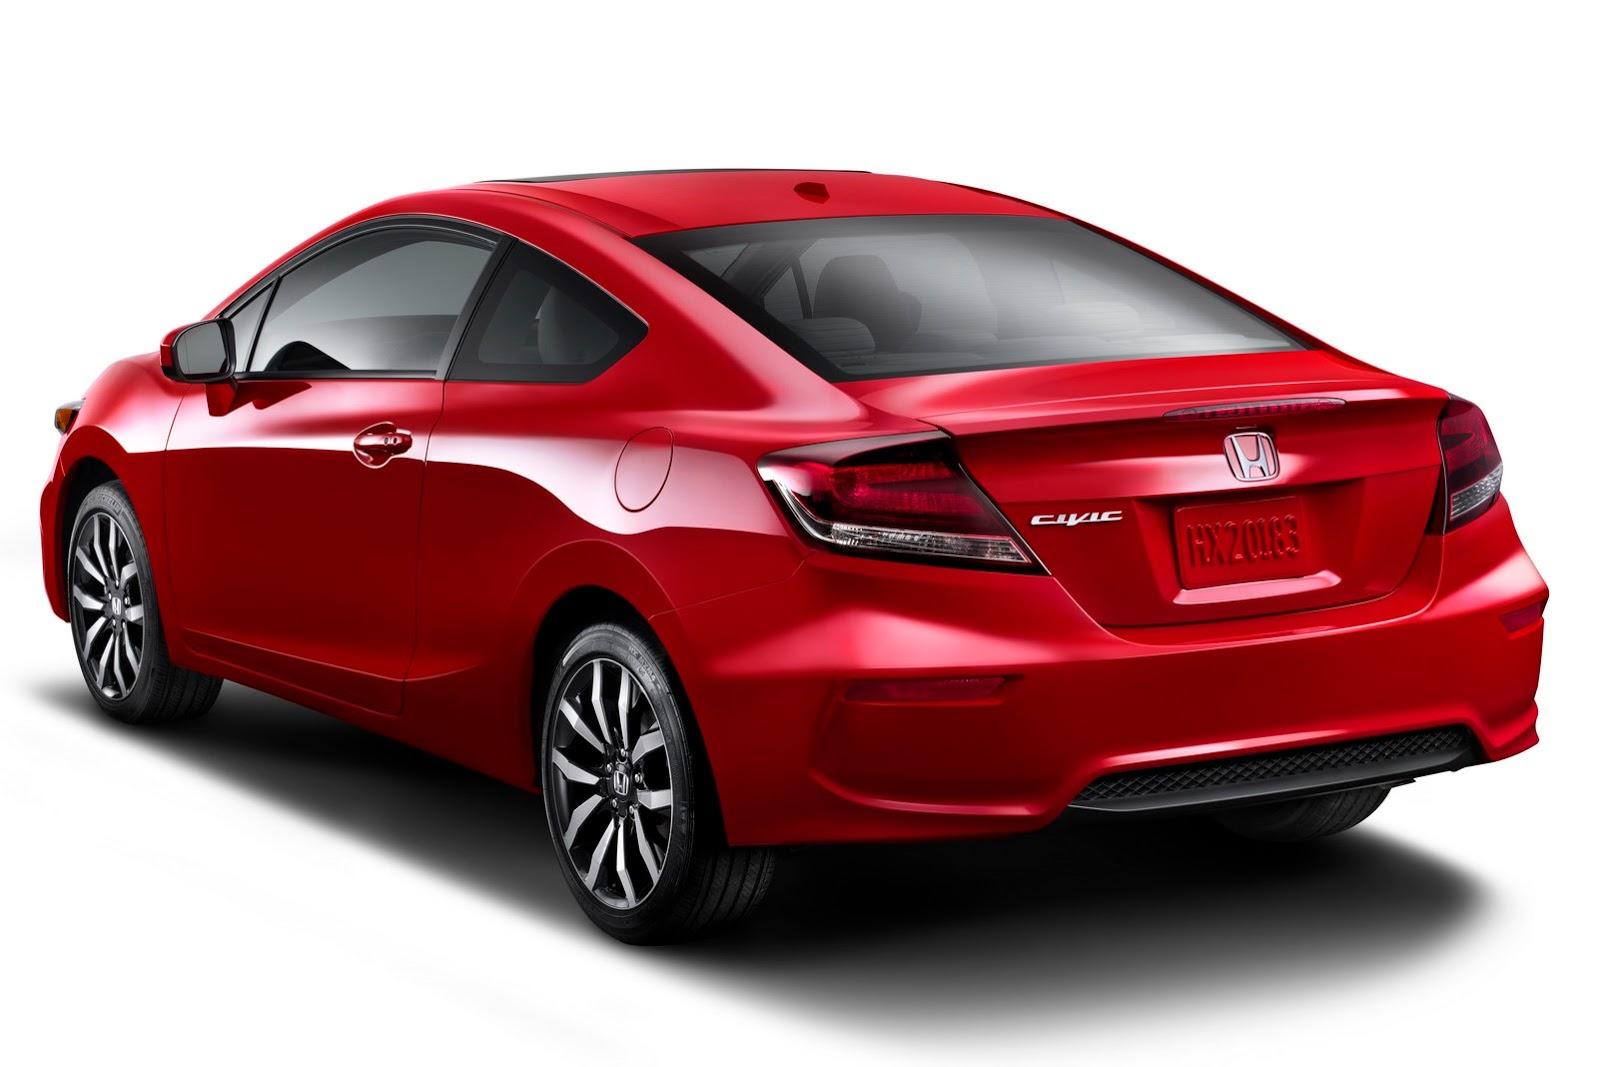 2014 Honda Civic Coupe At SEMA: New Looks And More